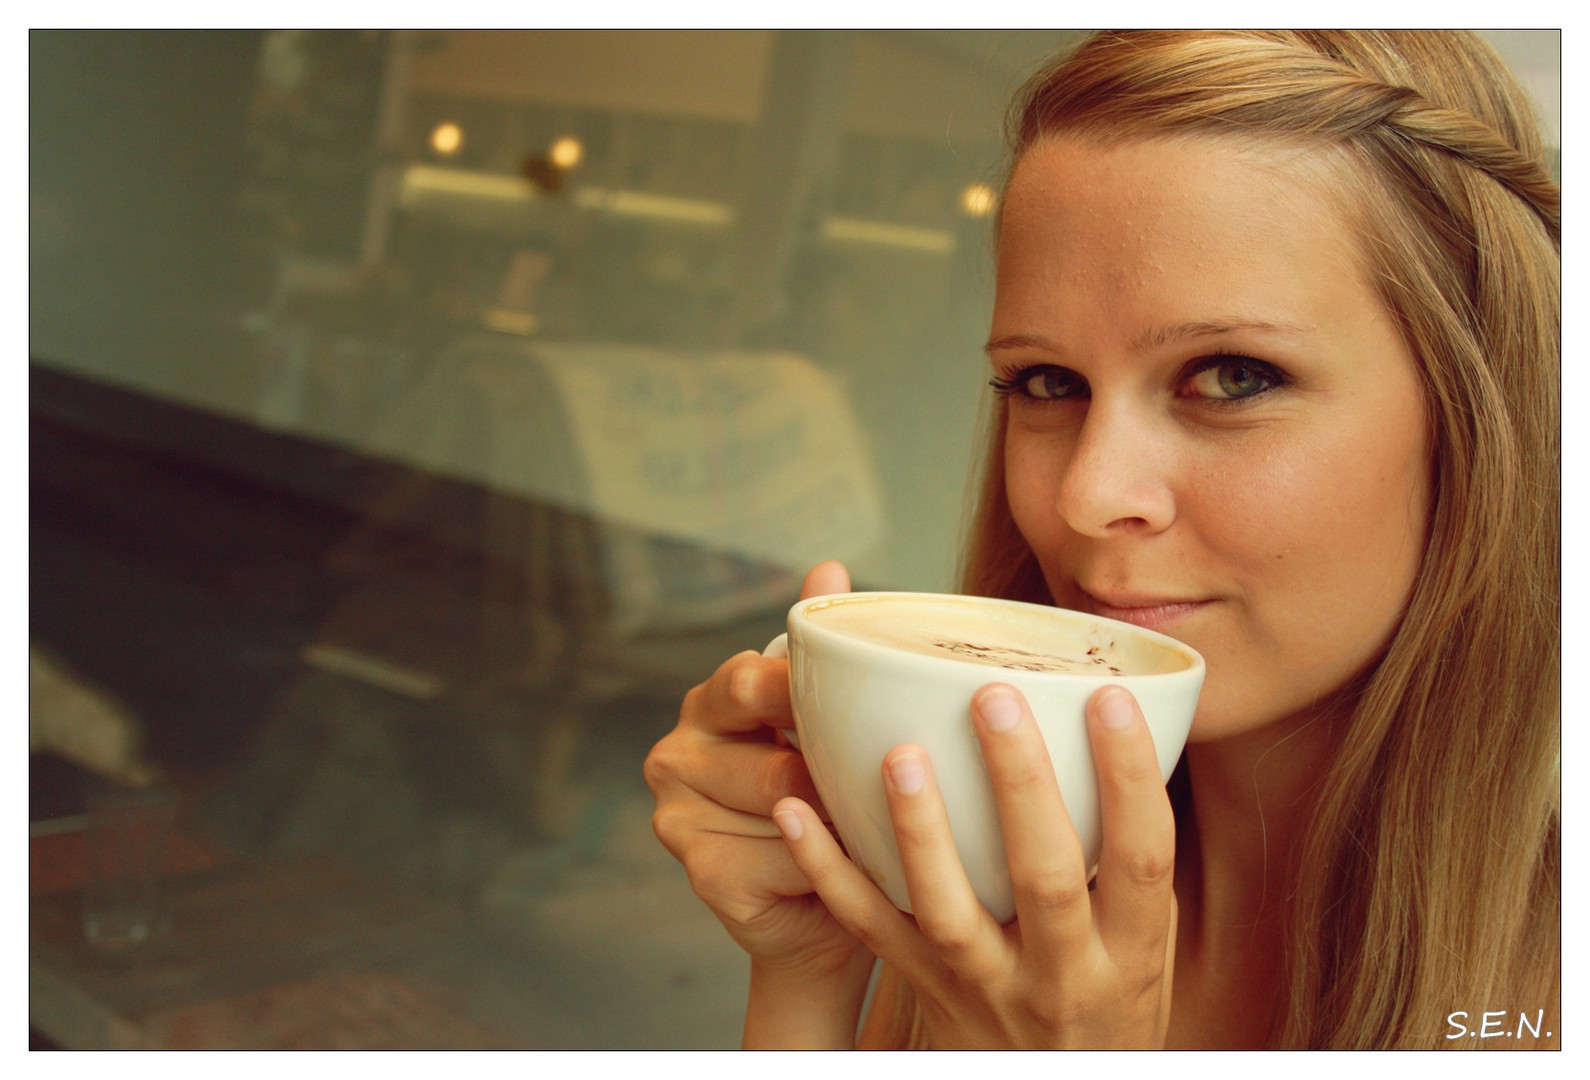 Kaffee, Kaffee, Kaffee....